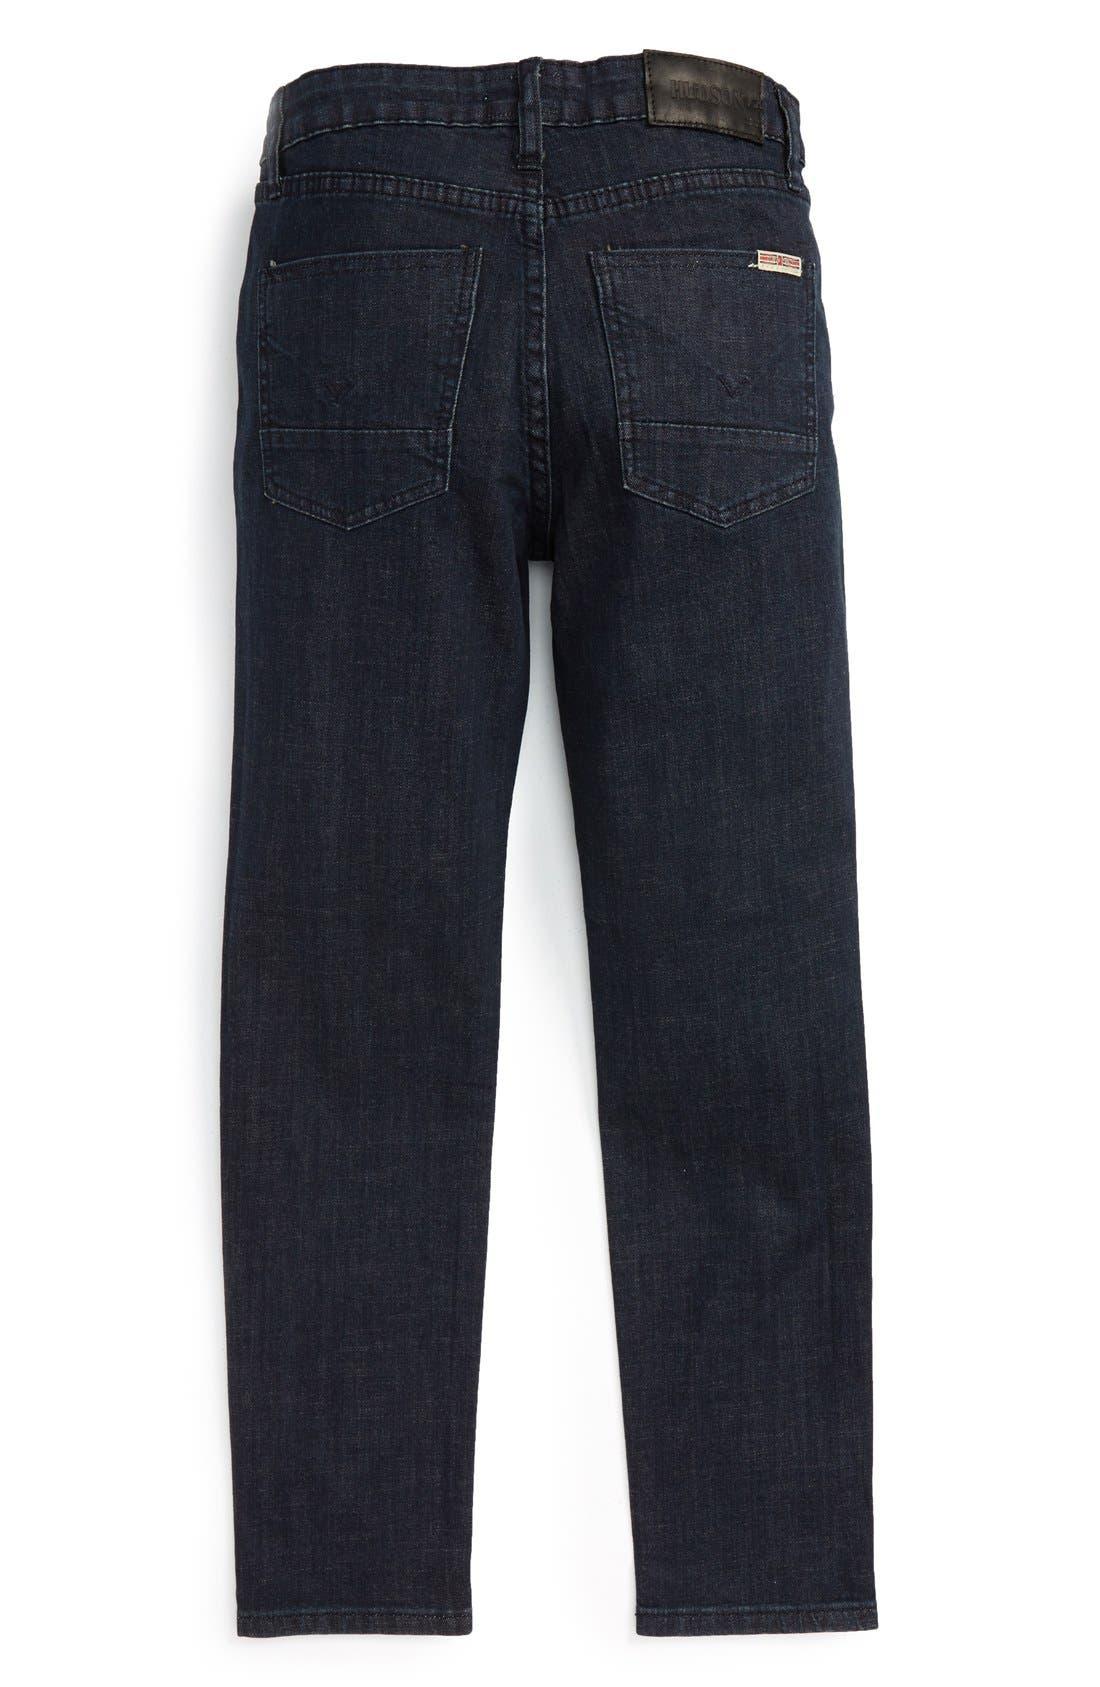 Jagger Slim Fit Straight Leg Jeans,                             Alternate thumbnail 12, color,